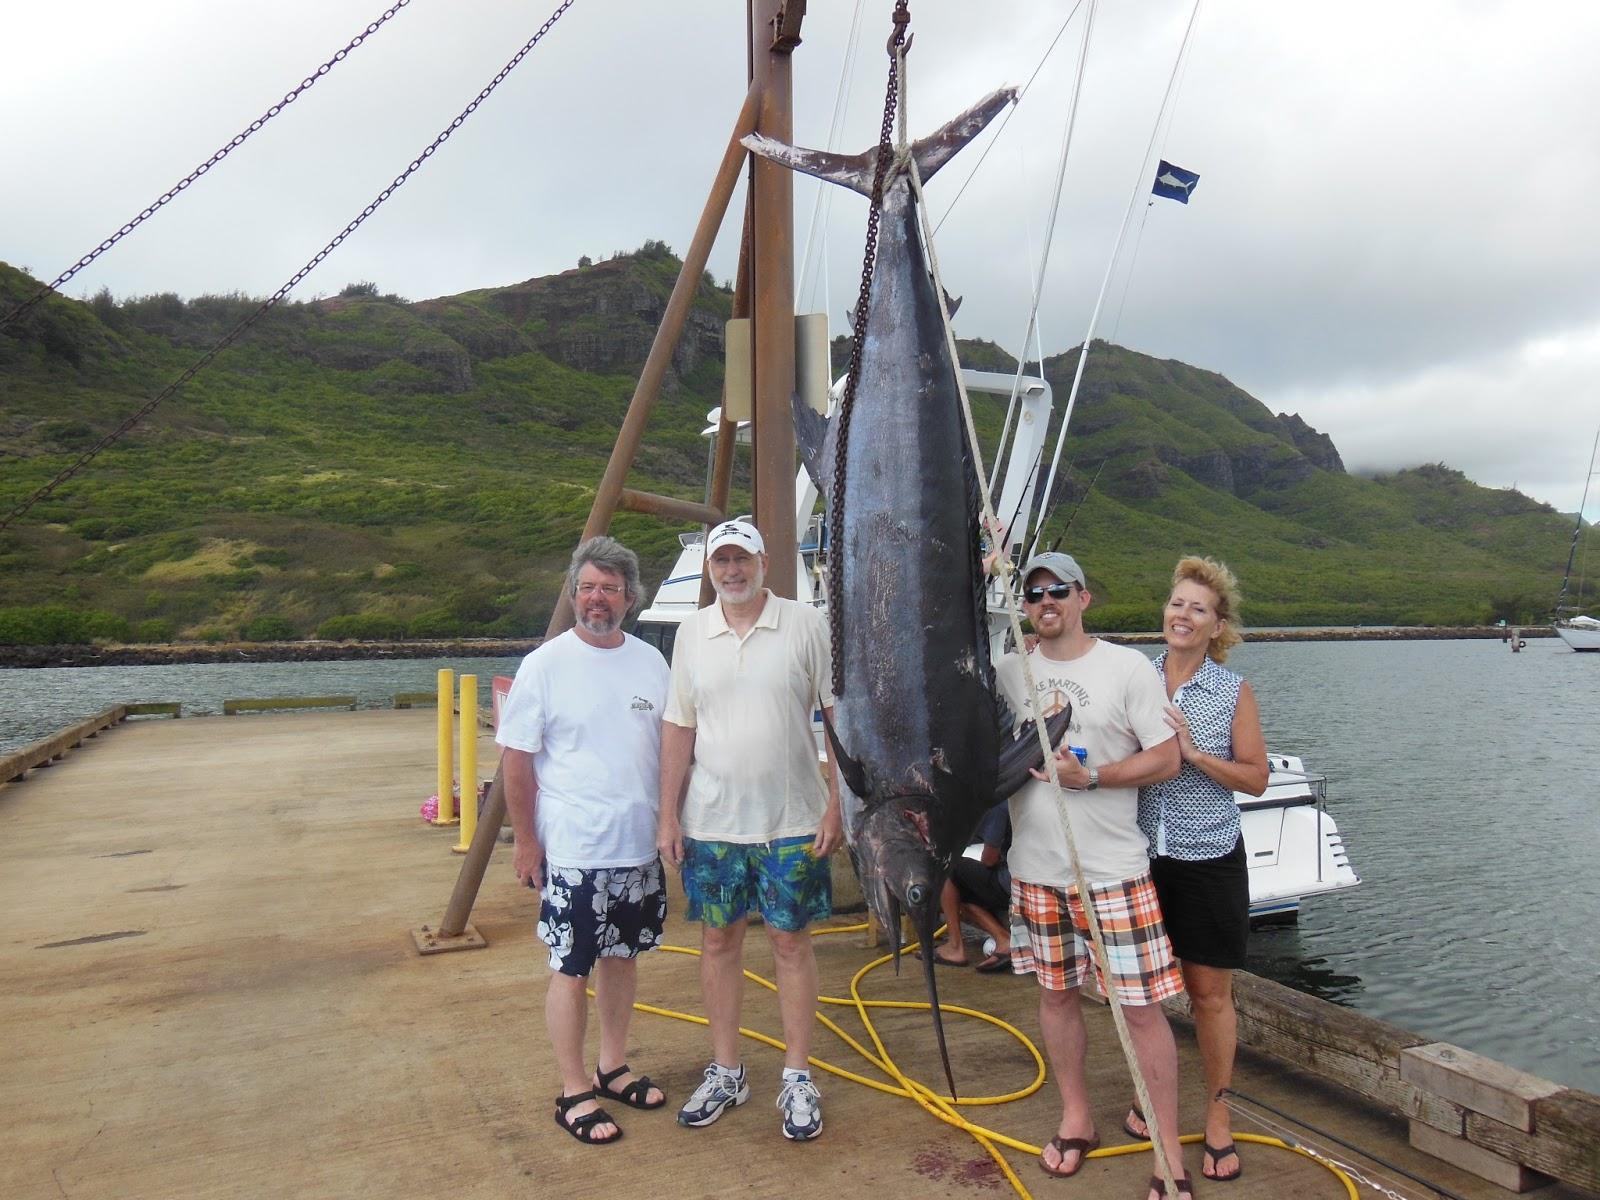 C lure fishing chaters kauai hawaii 310 pound blue marlin for Kauai fishing report